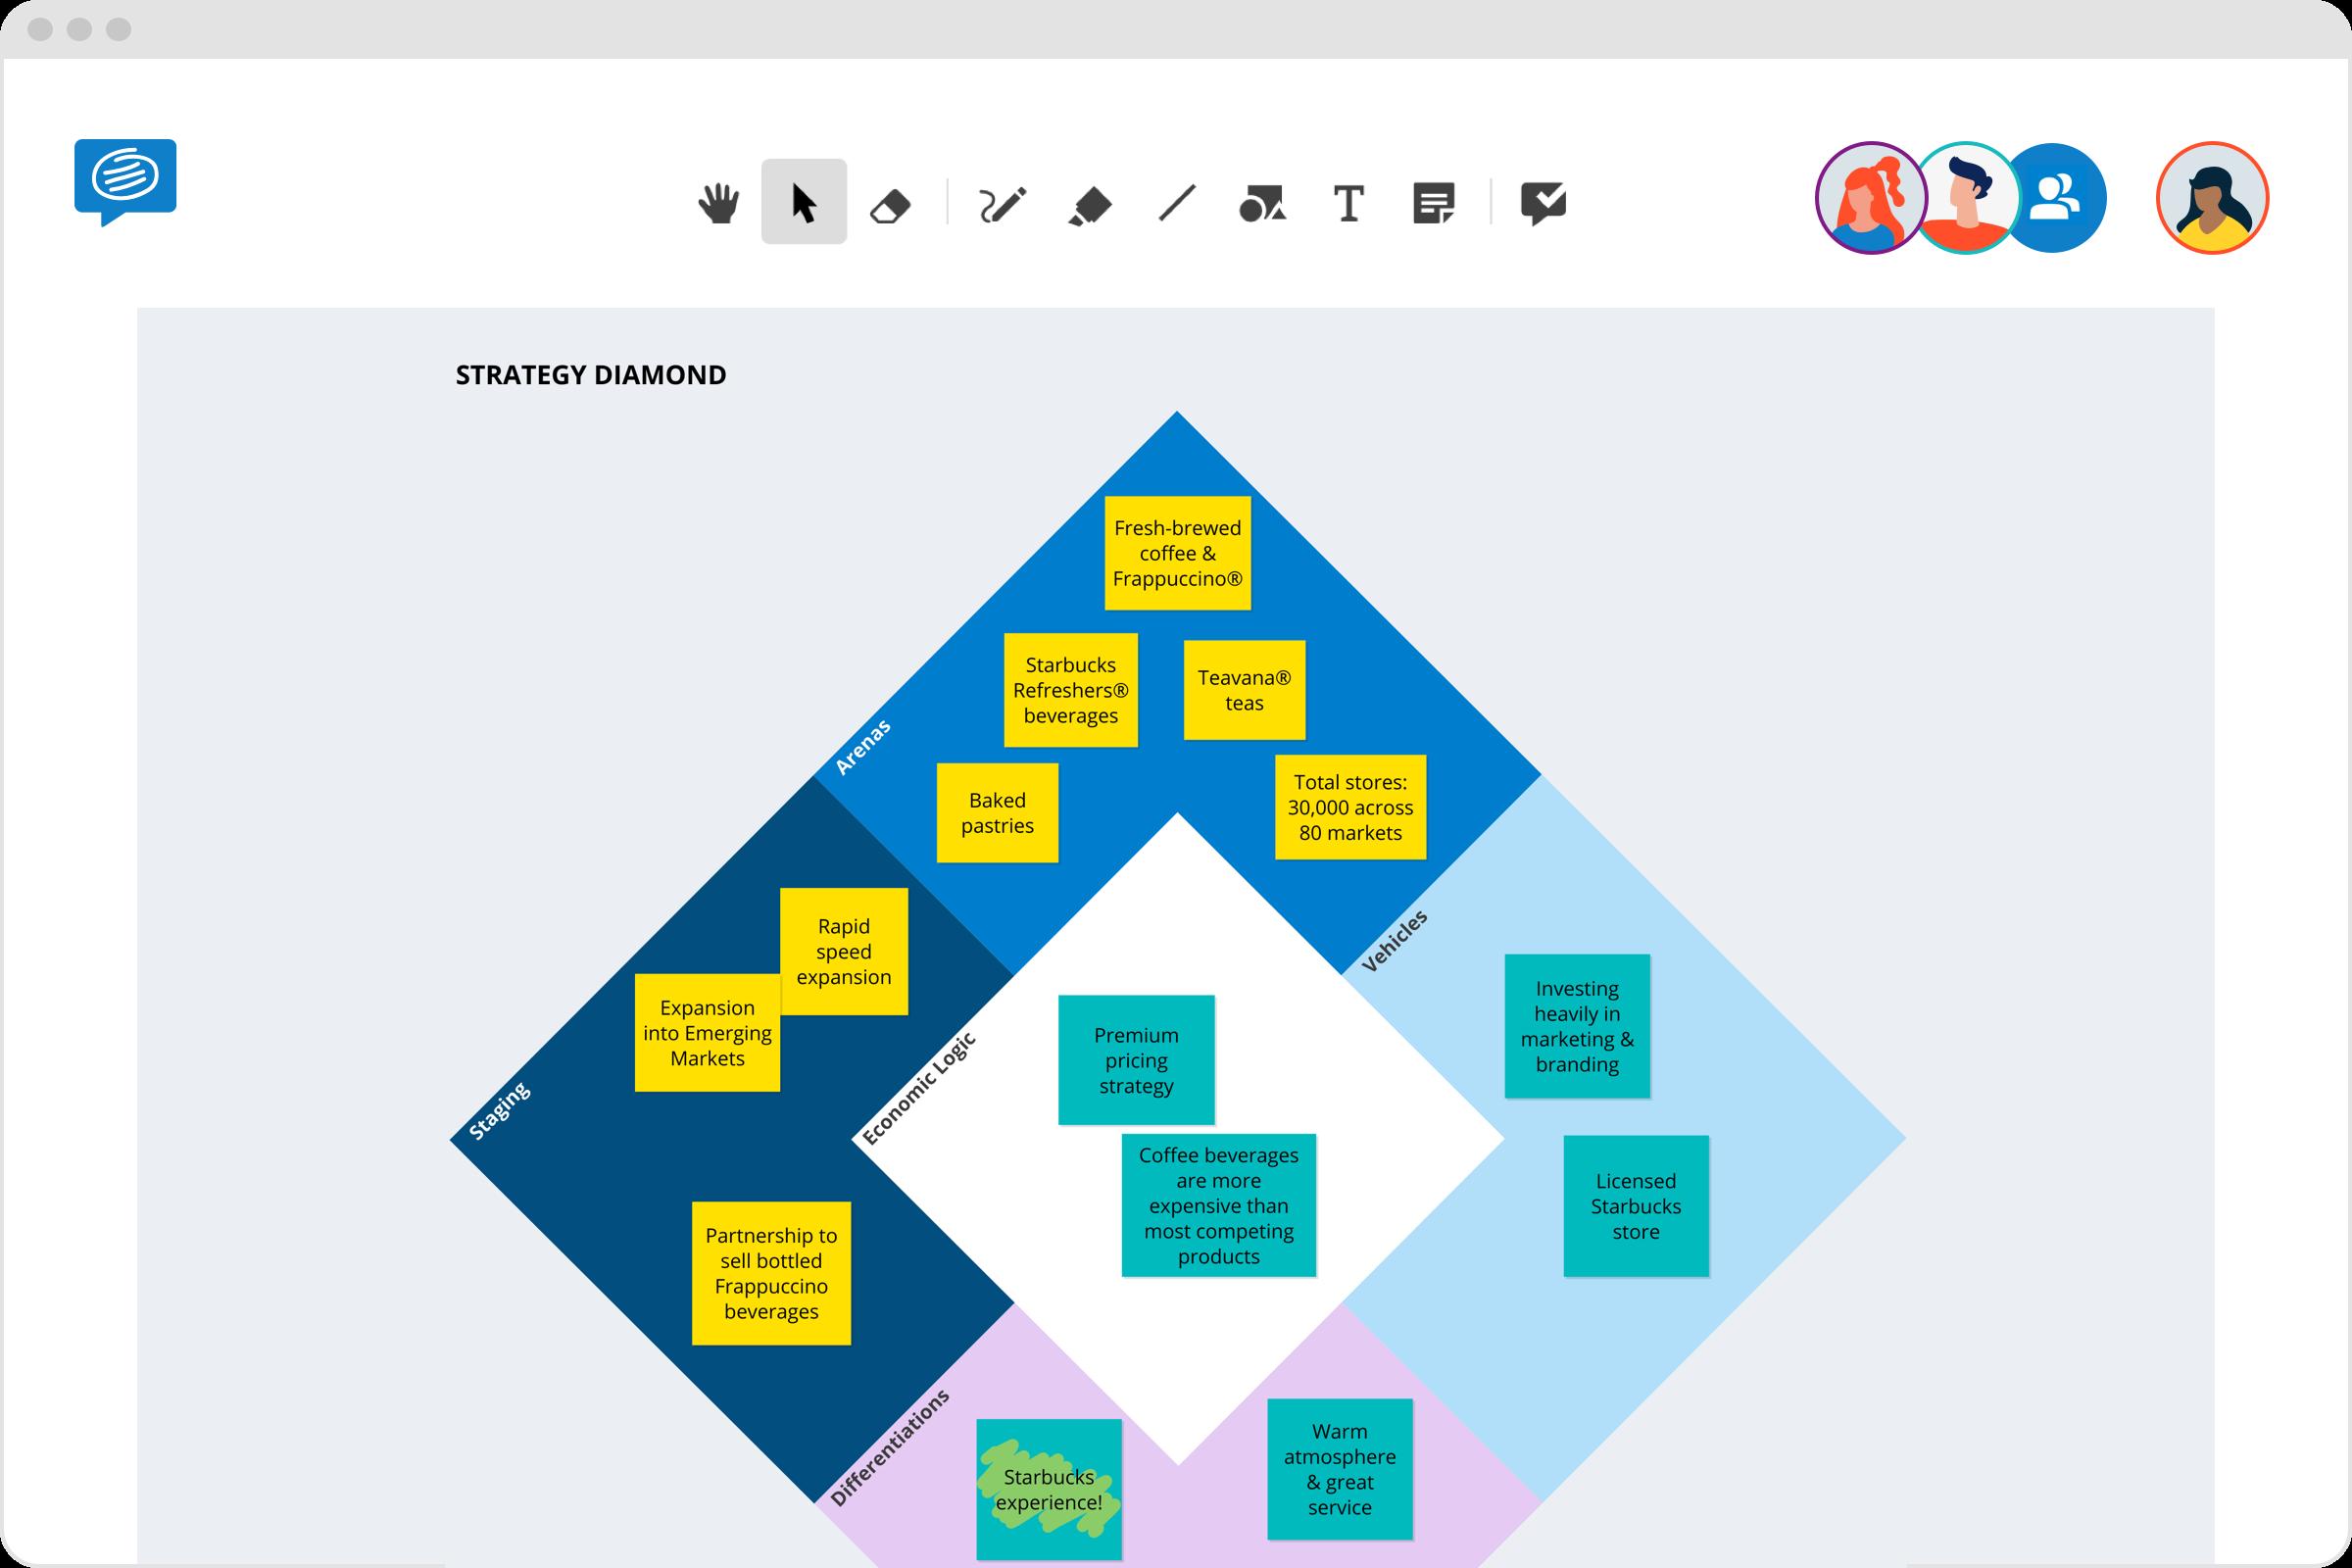 Strategy diamond example